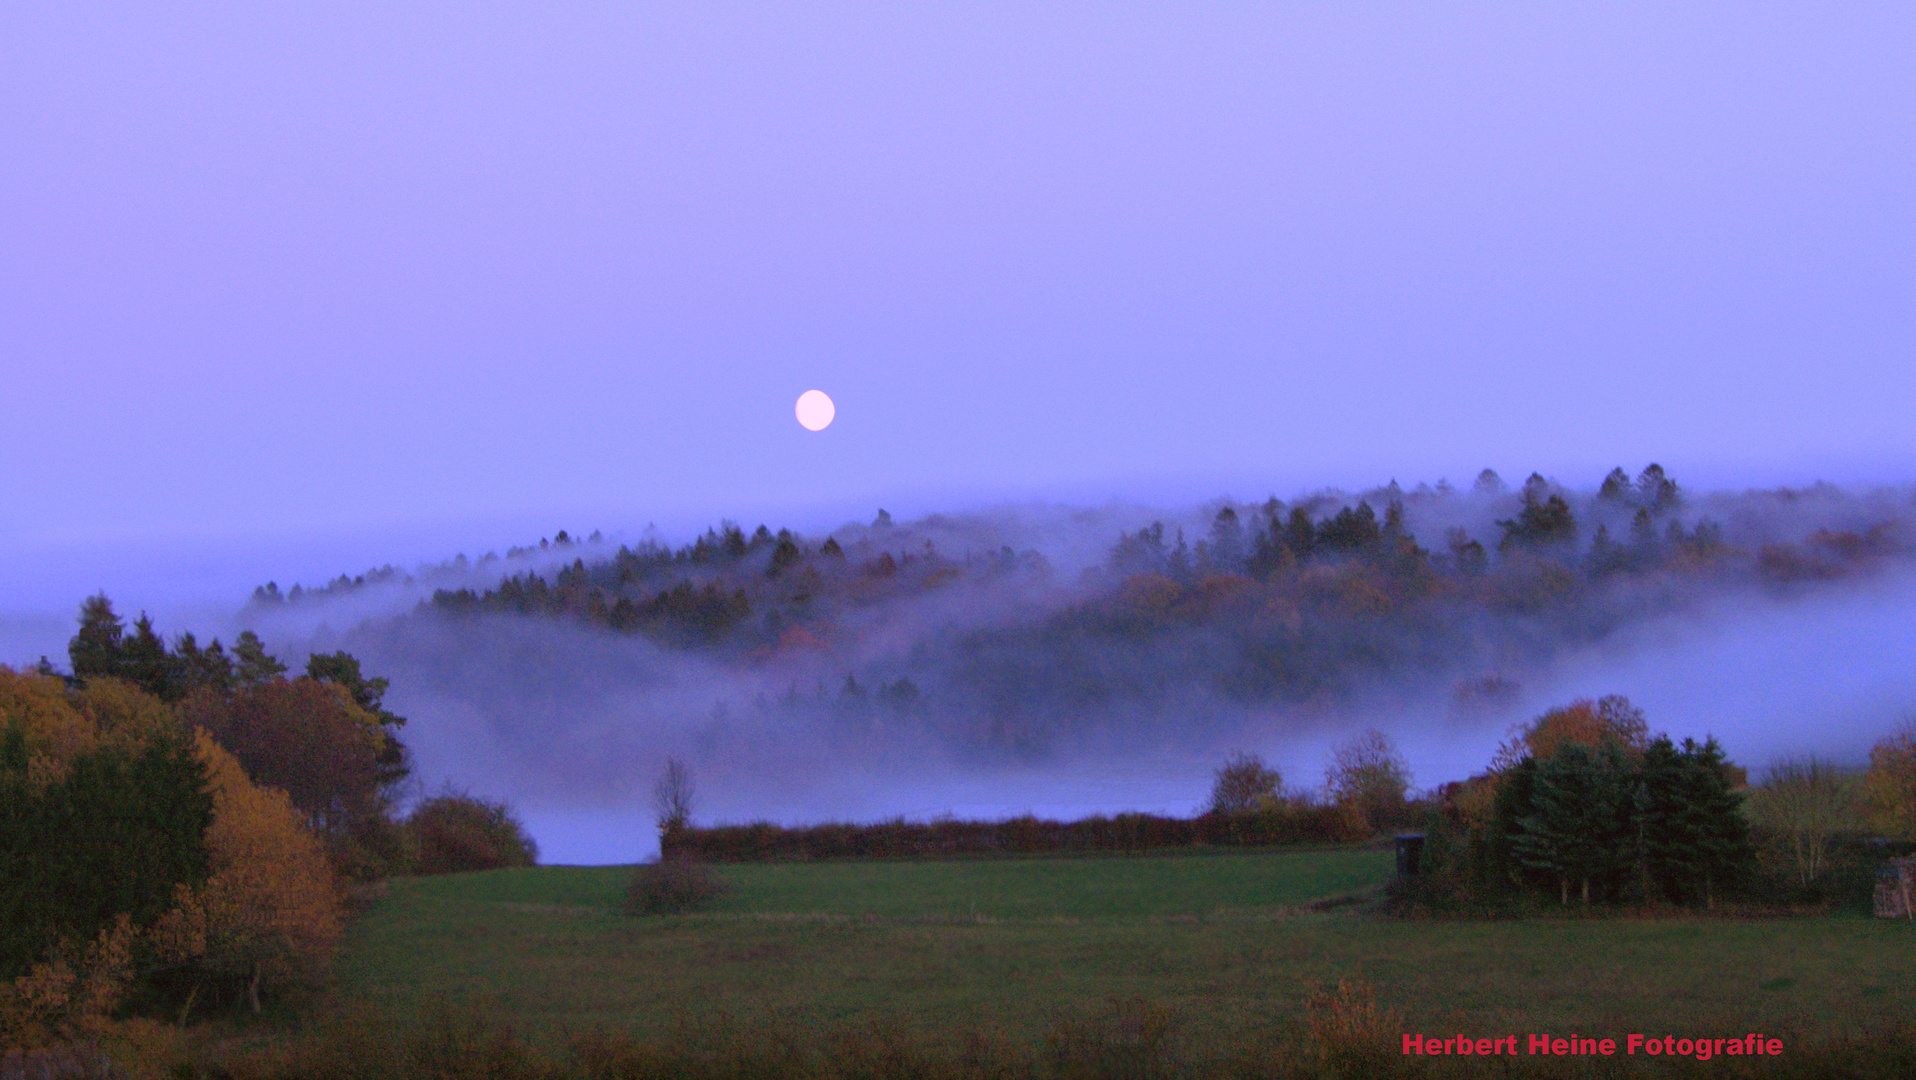 Der Mond, erscheint am Horizont.....